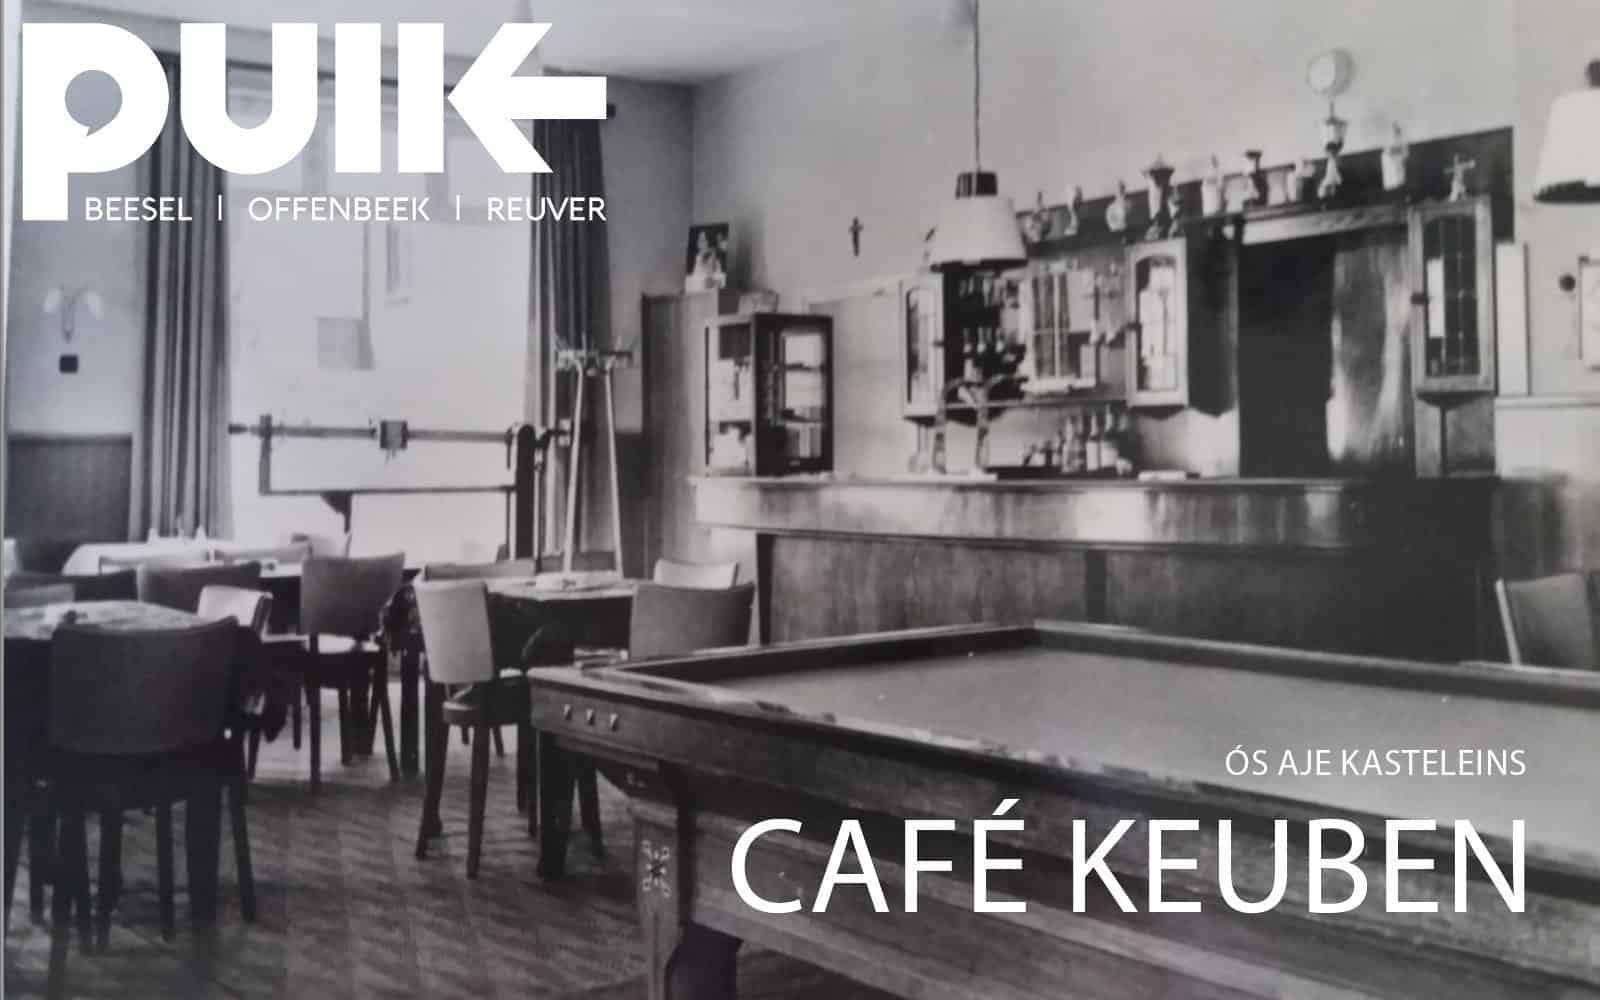 26 december 2018 - Cafe Keuben